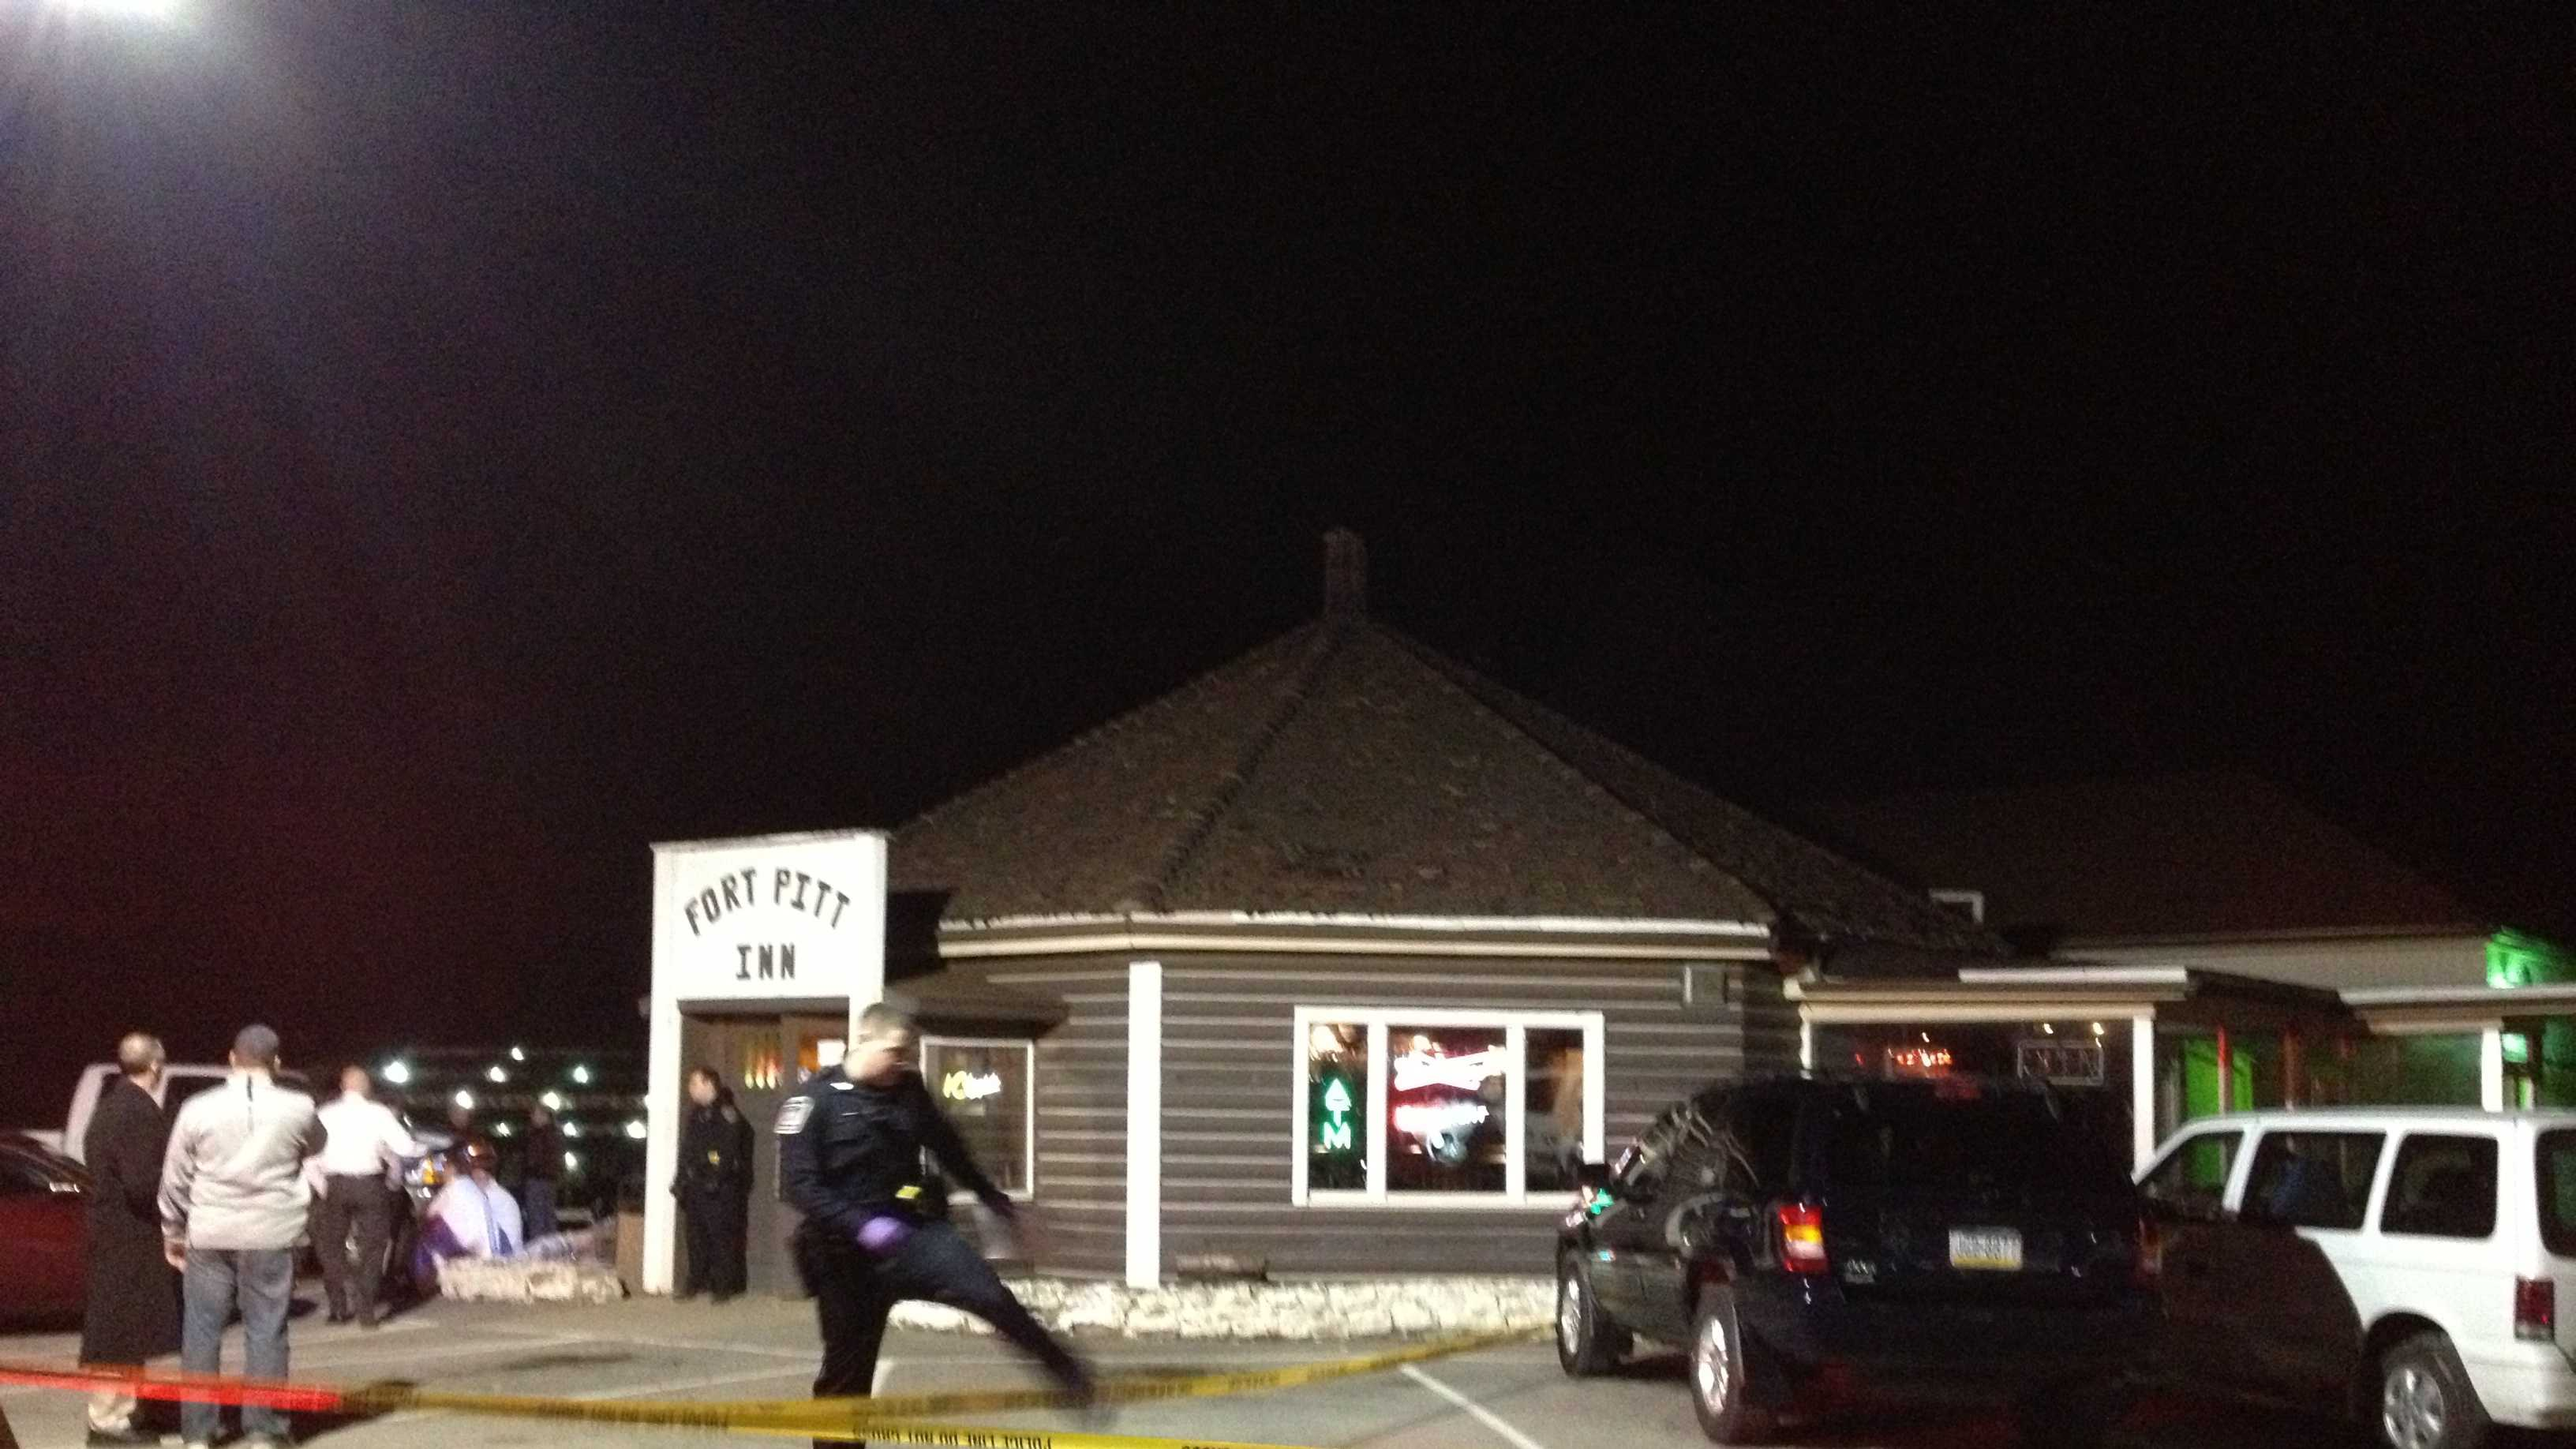 Fort Pitt Inn in North Fayette Township